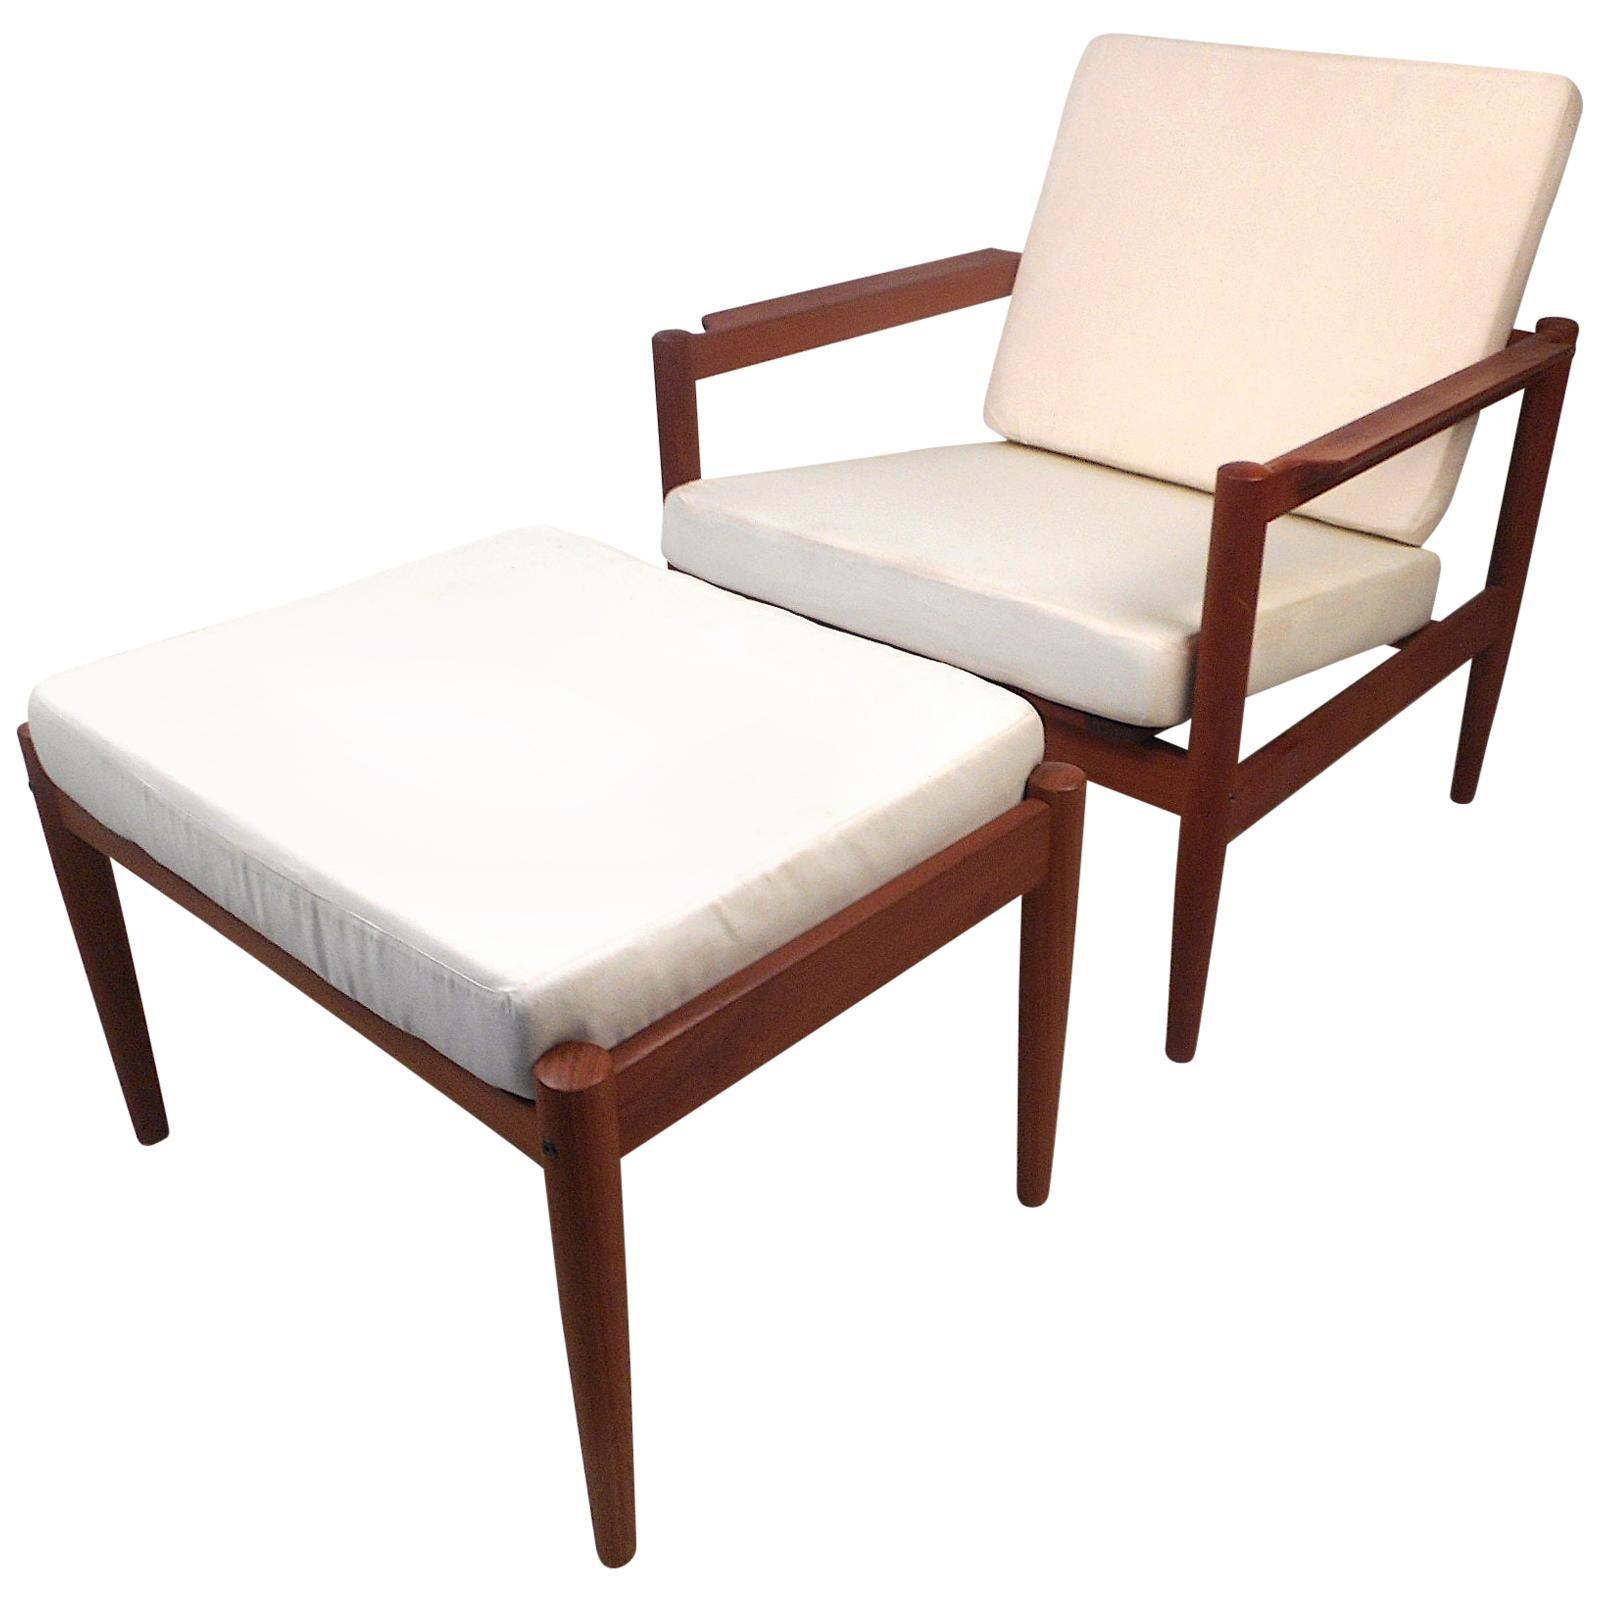 Danish Modern Lounge Chair and Ottoman by Bernstorffsminde Møbelfabrik